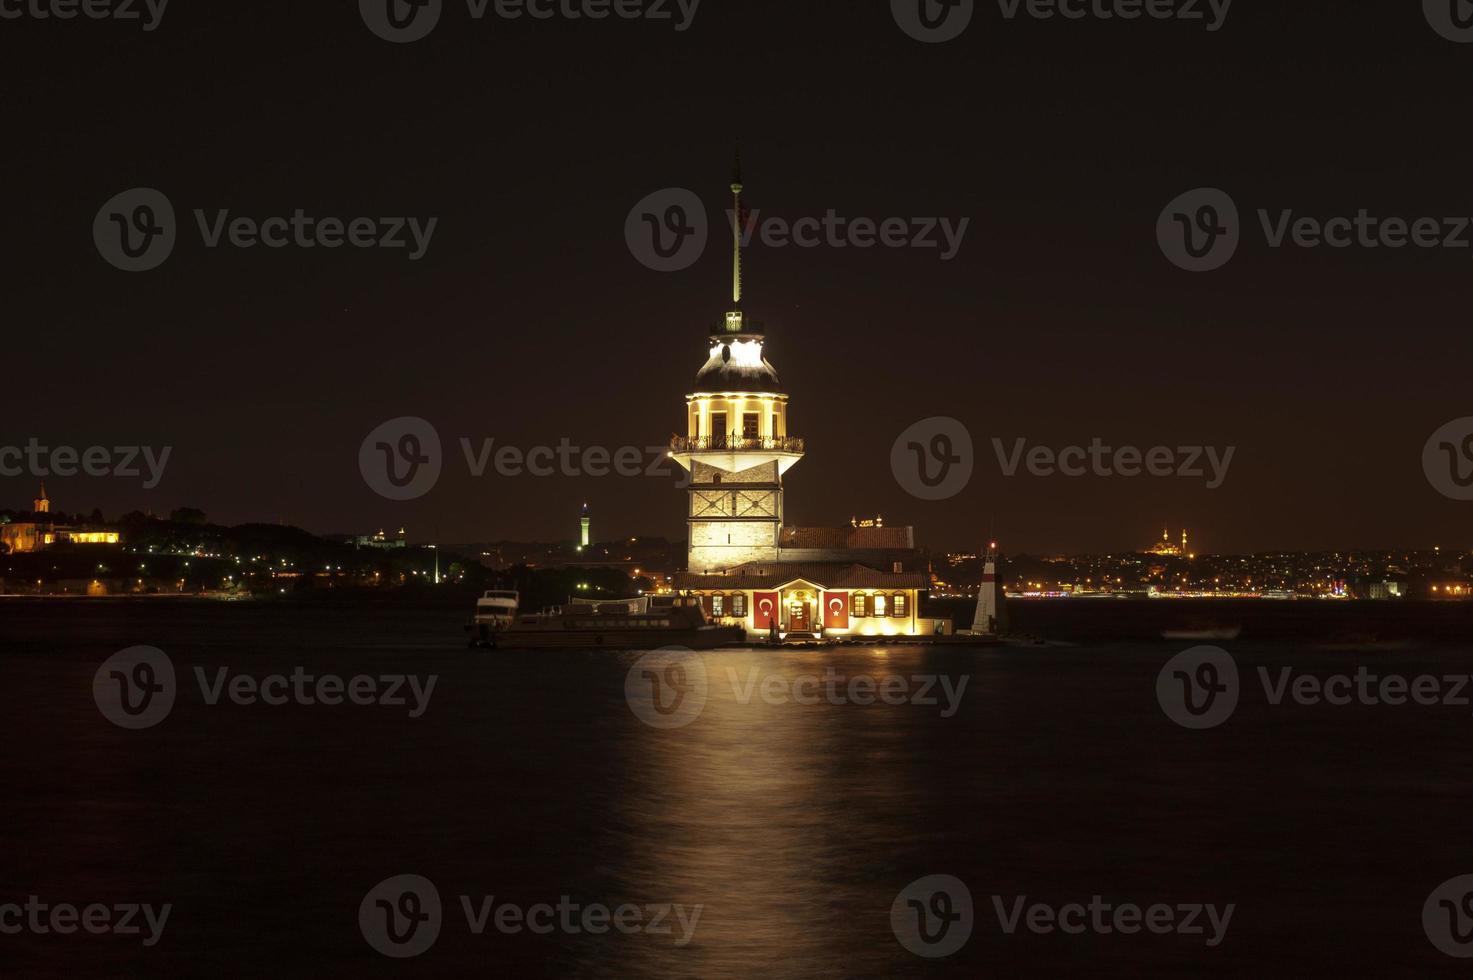 jungfrunens torn (turkiska: kiz kulesi), istanbul foto